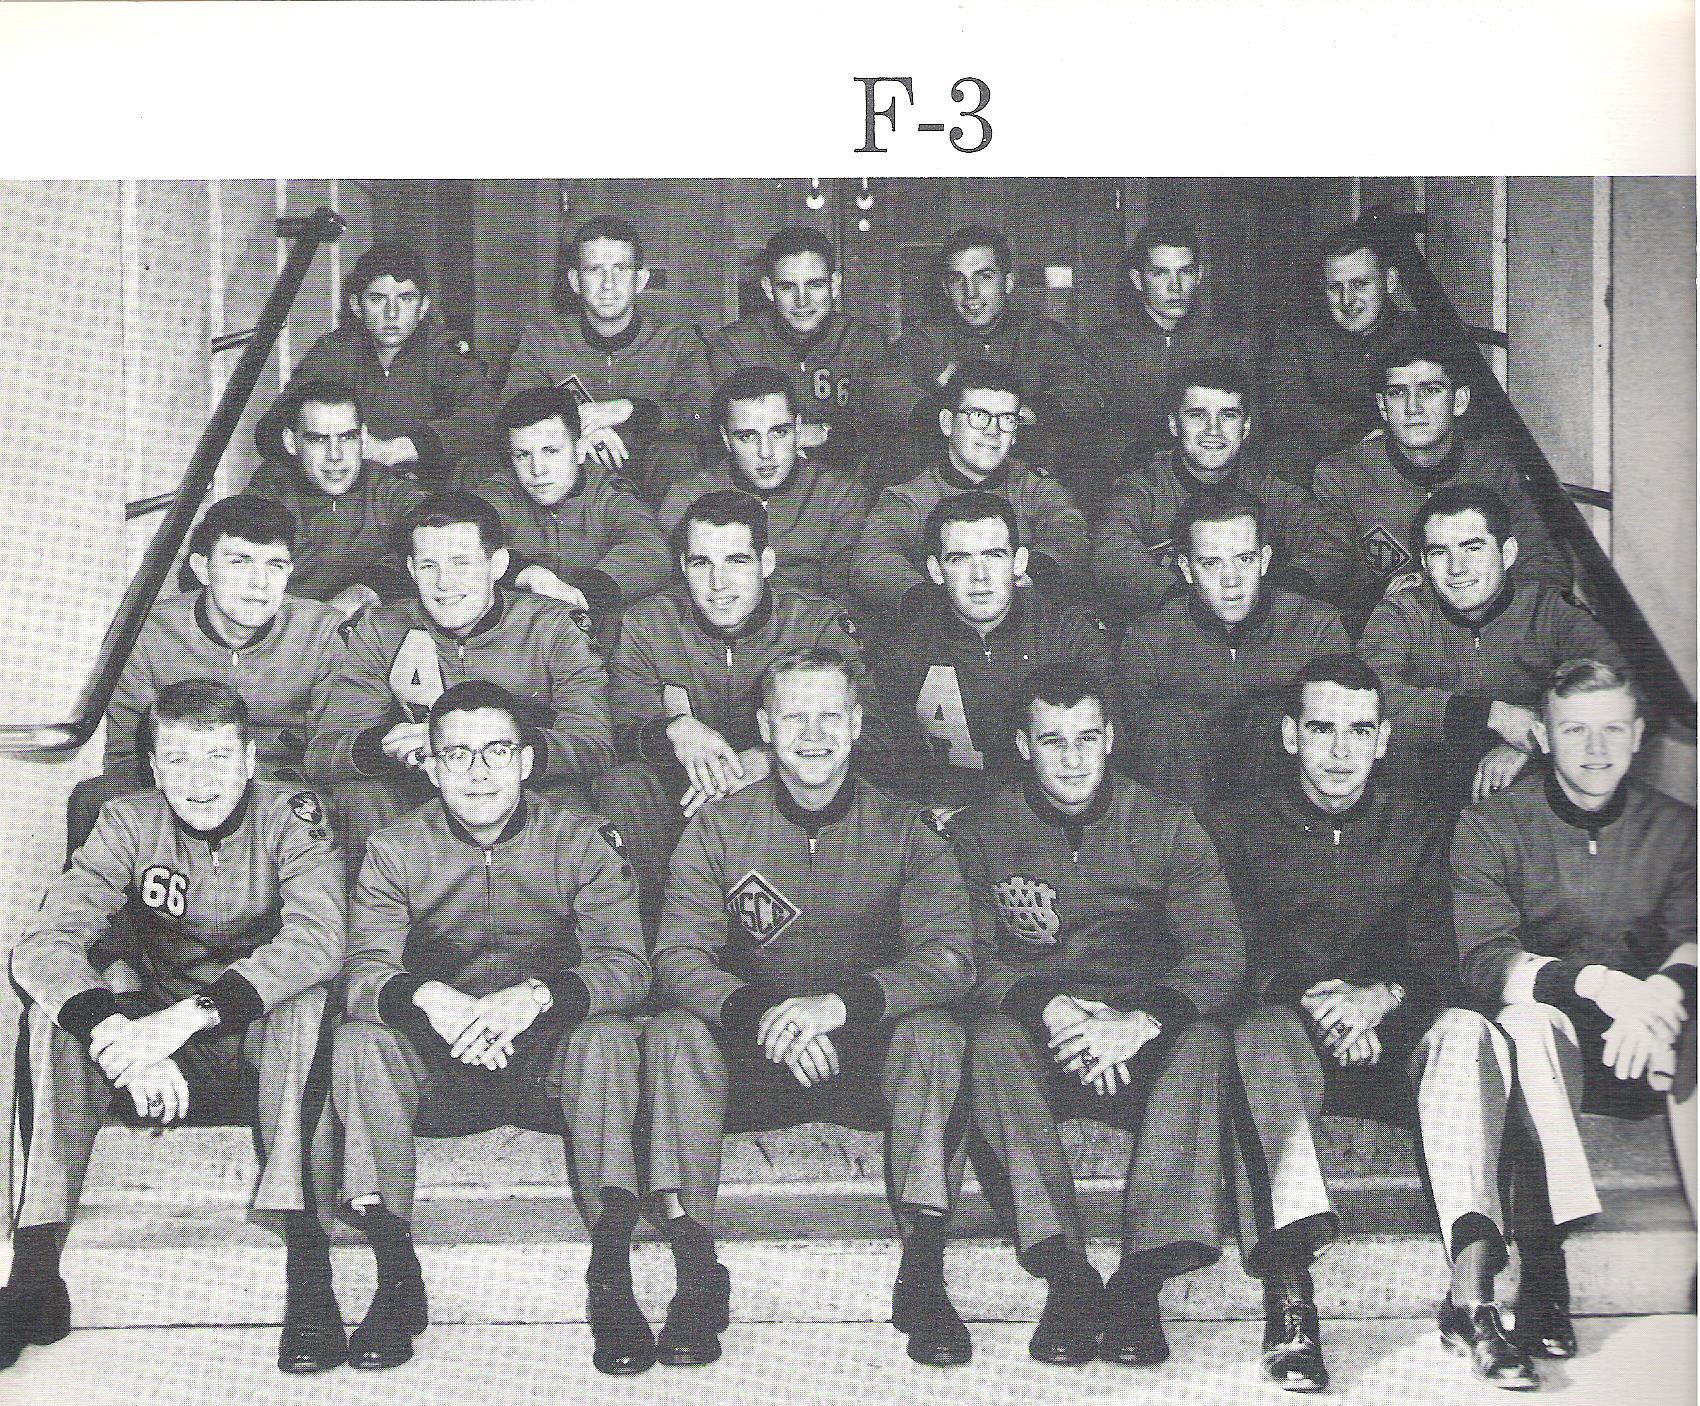 151-66F3